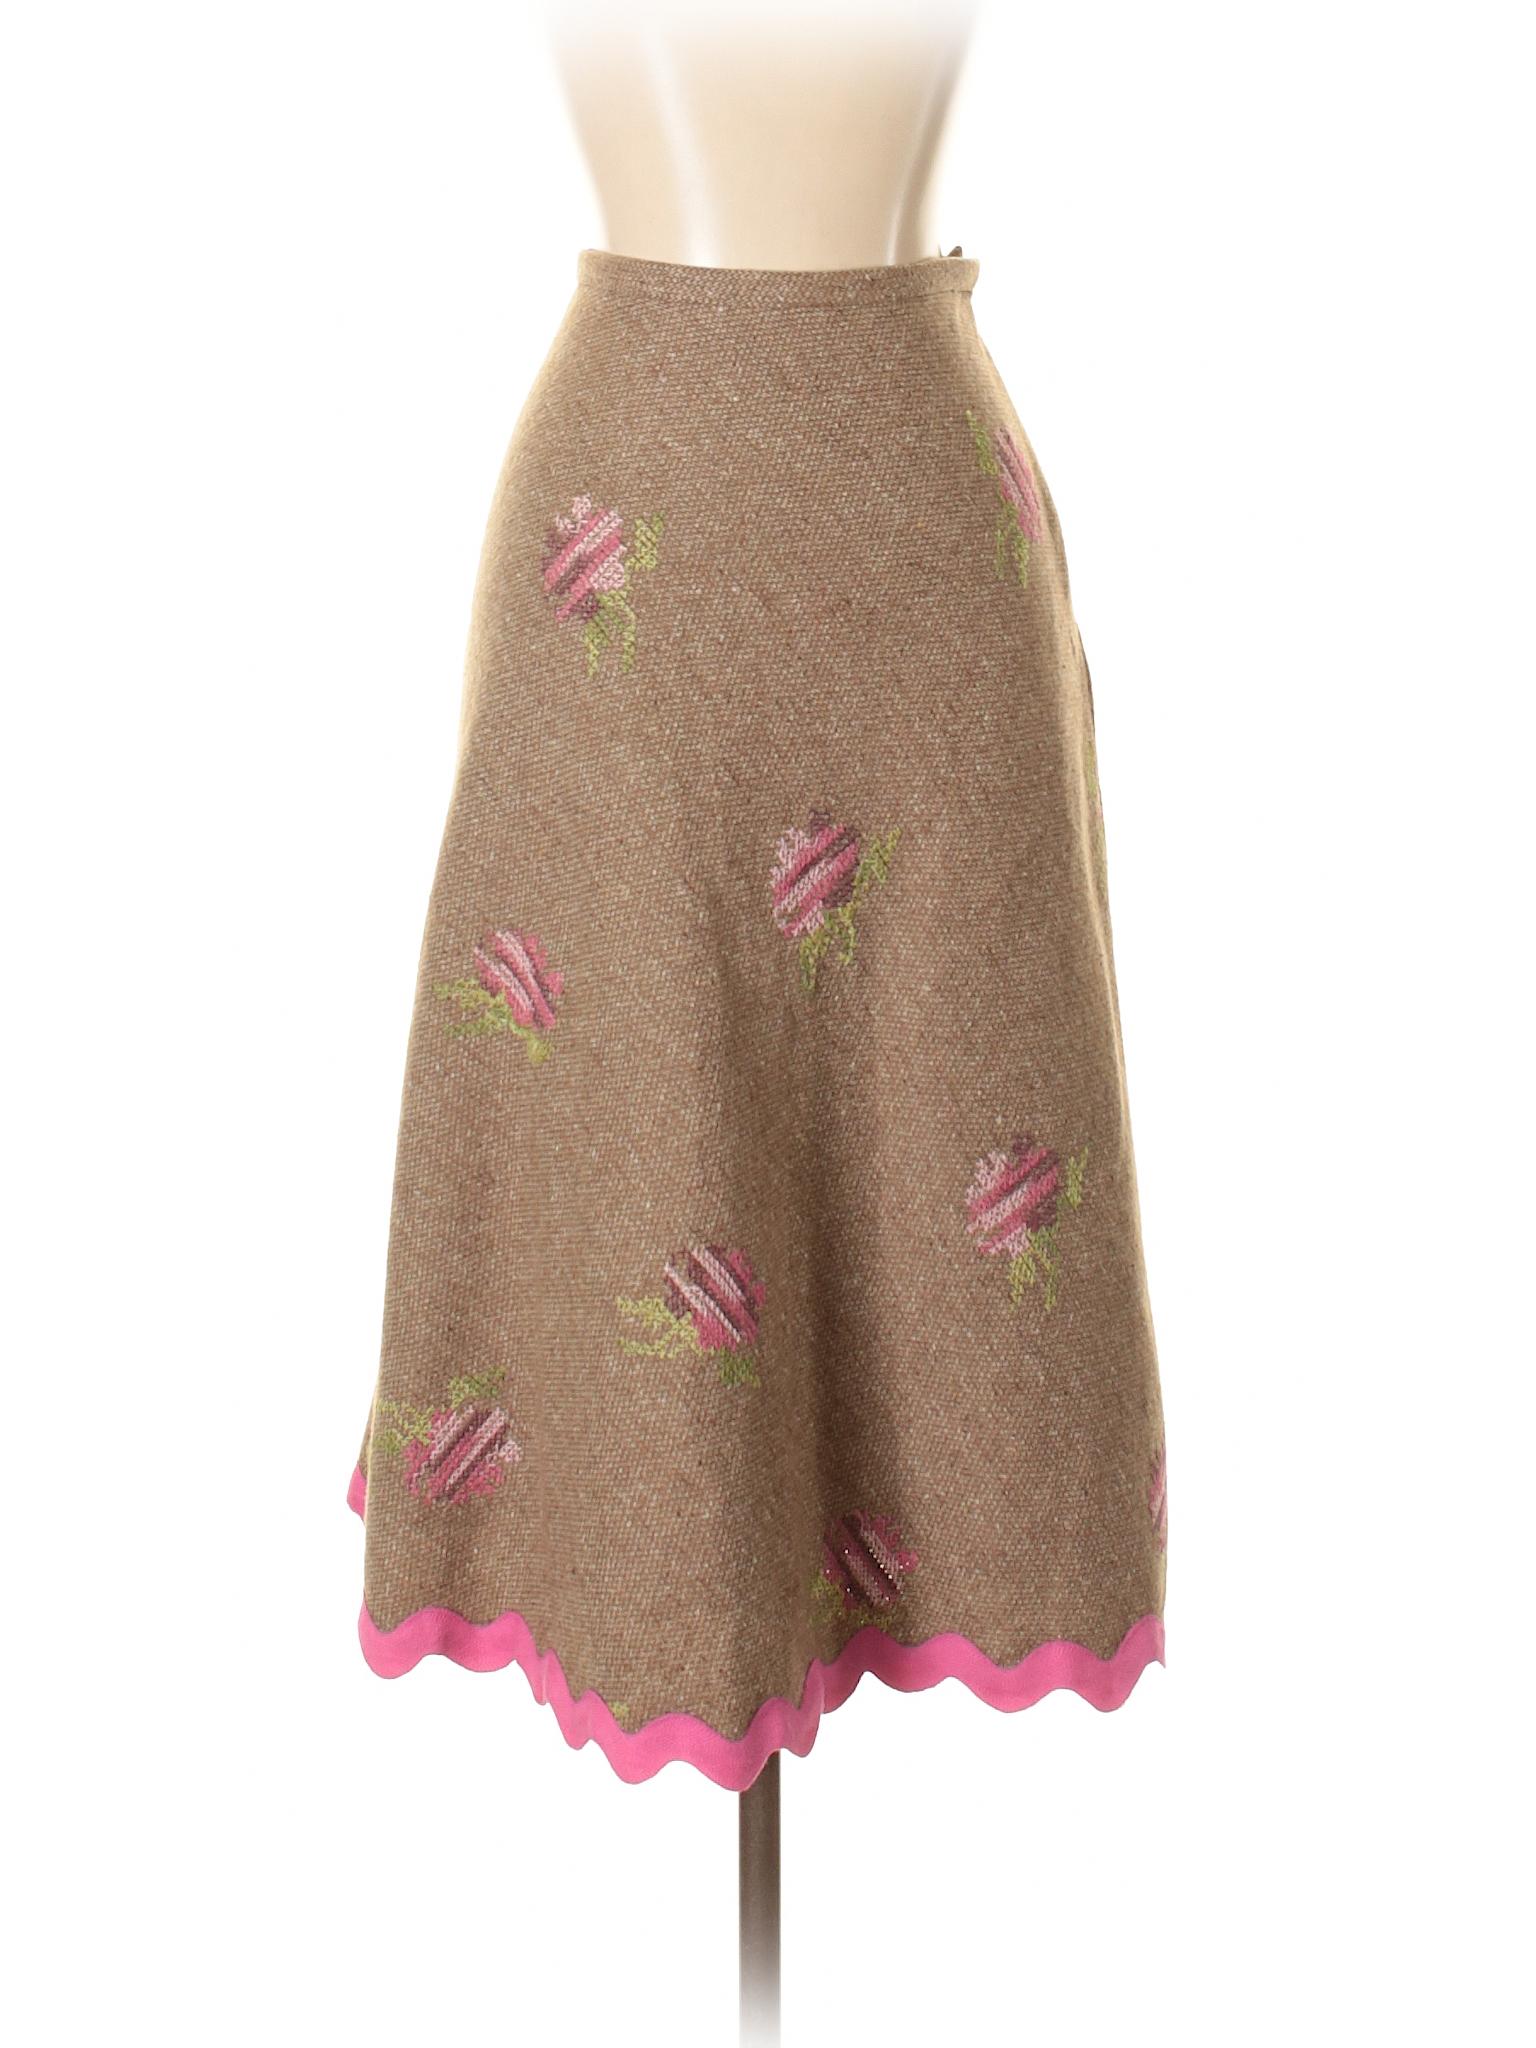 Boutique Casual Boutique Casual Casual Skirt Skirt Casual Casual Boutique Skirt Skirt Boutique Boutique 4qrxwXnAU4